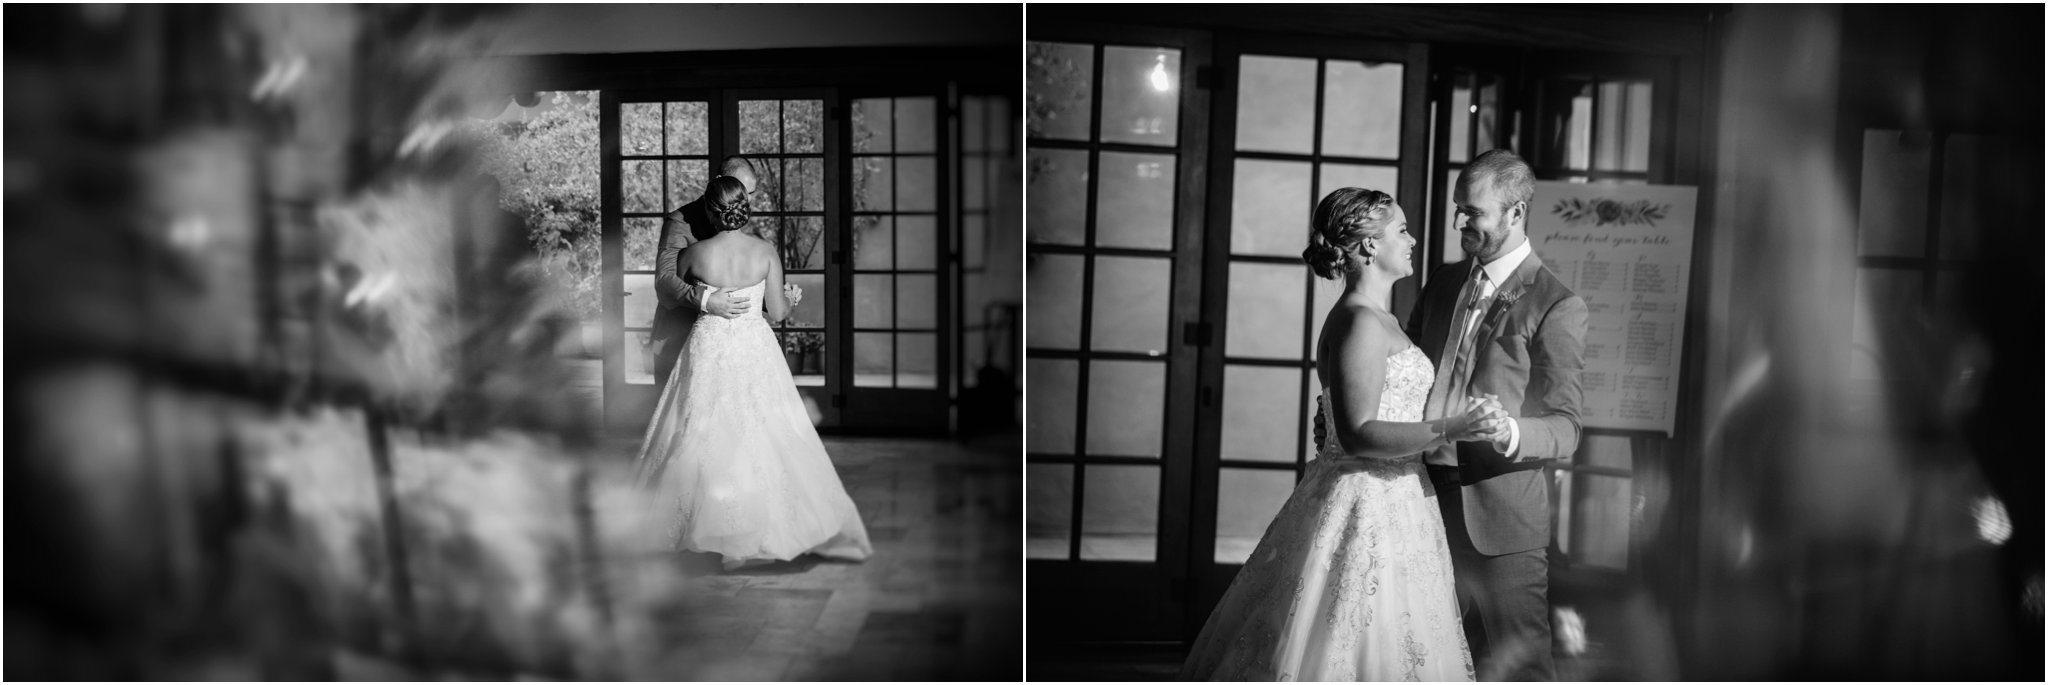 0072albuquerque-wedding-photographer_-santa-fe-wedding-photographer_-southwest-wedding-photography_-blue-rose-studio